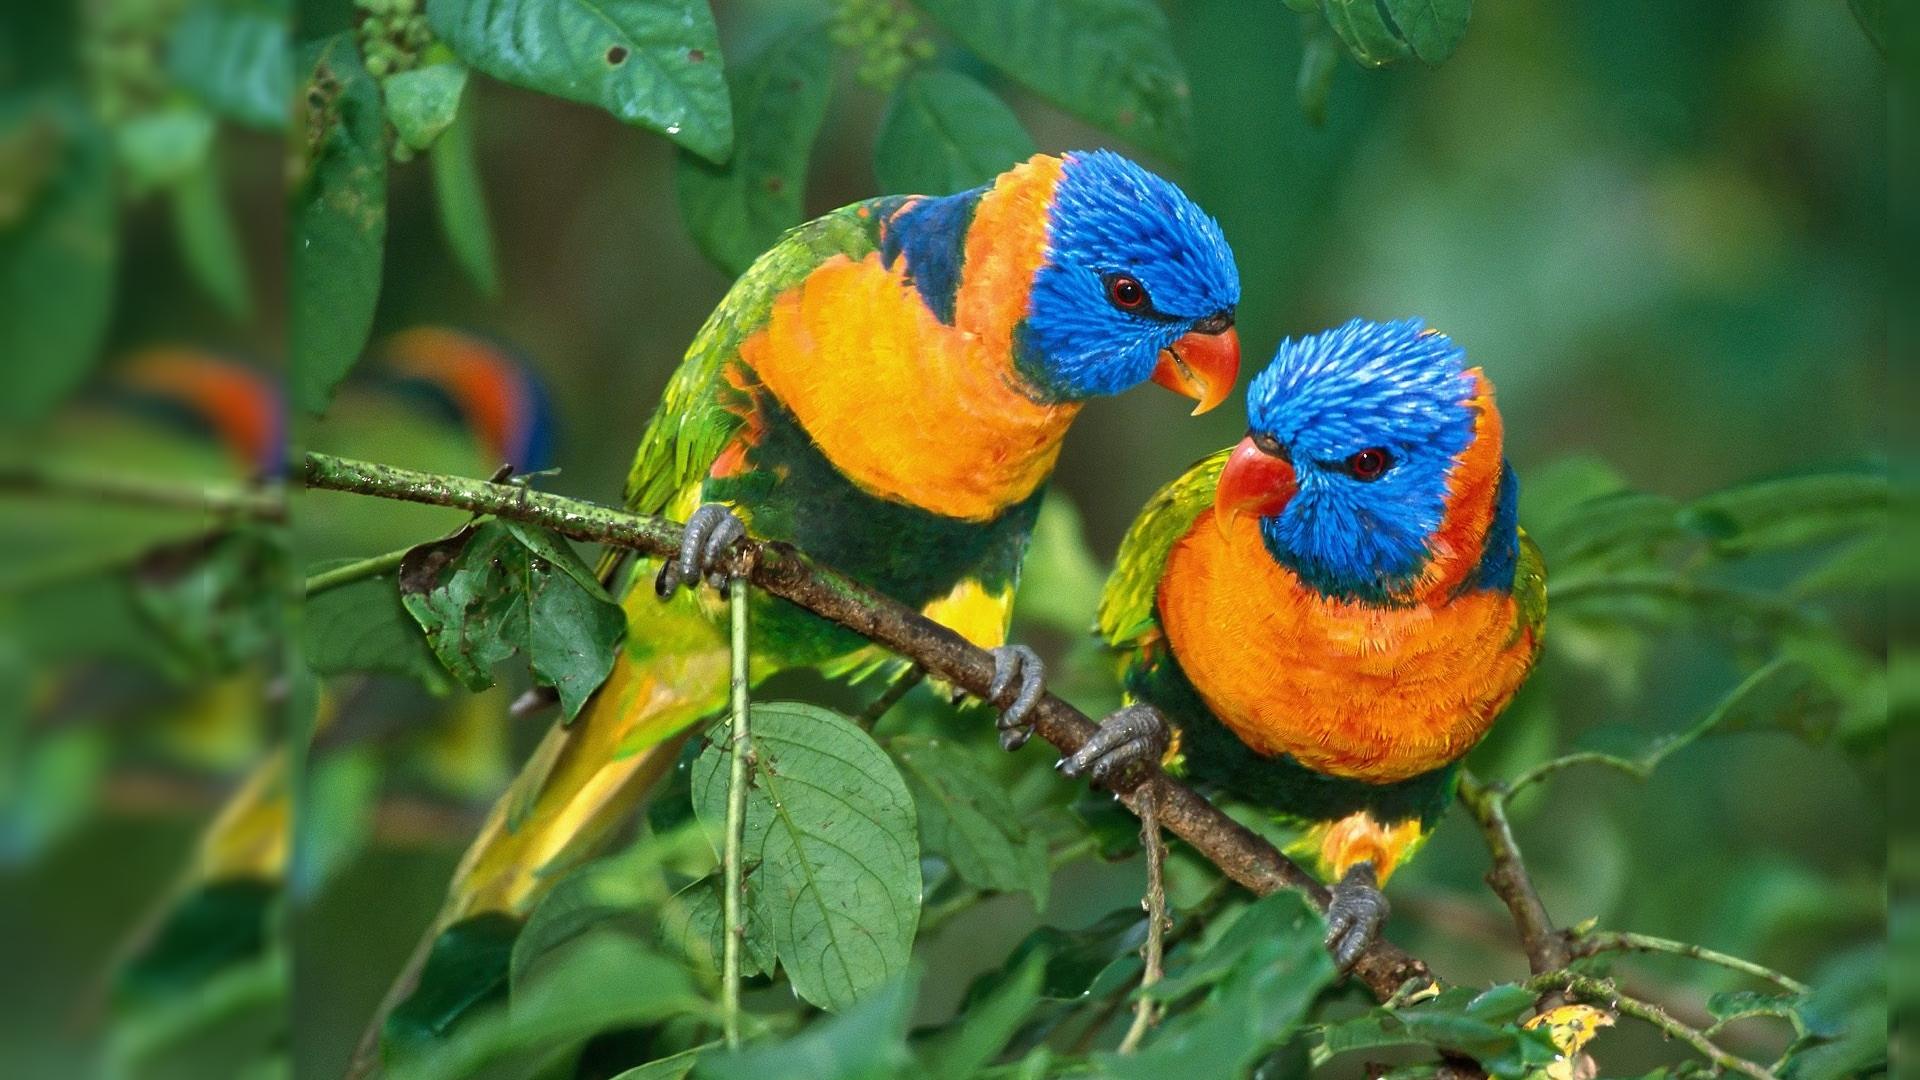 All Bird Wallpaper Download Nature Bird Hd 1920x1080 Wallpaper Teahub Io